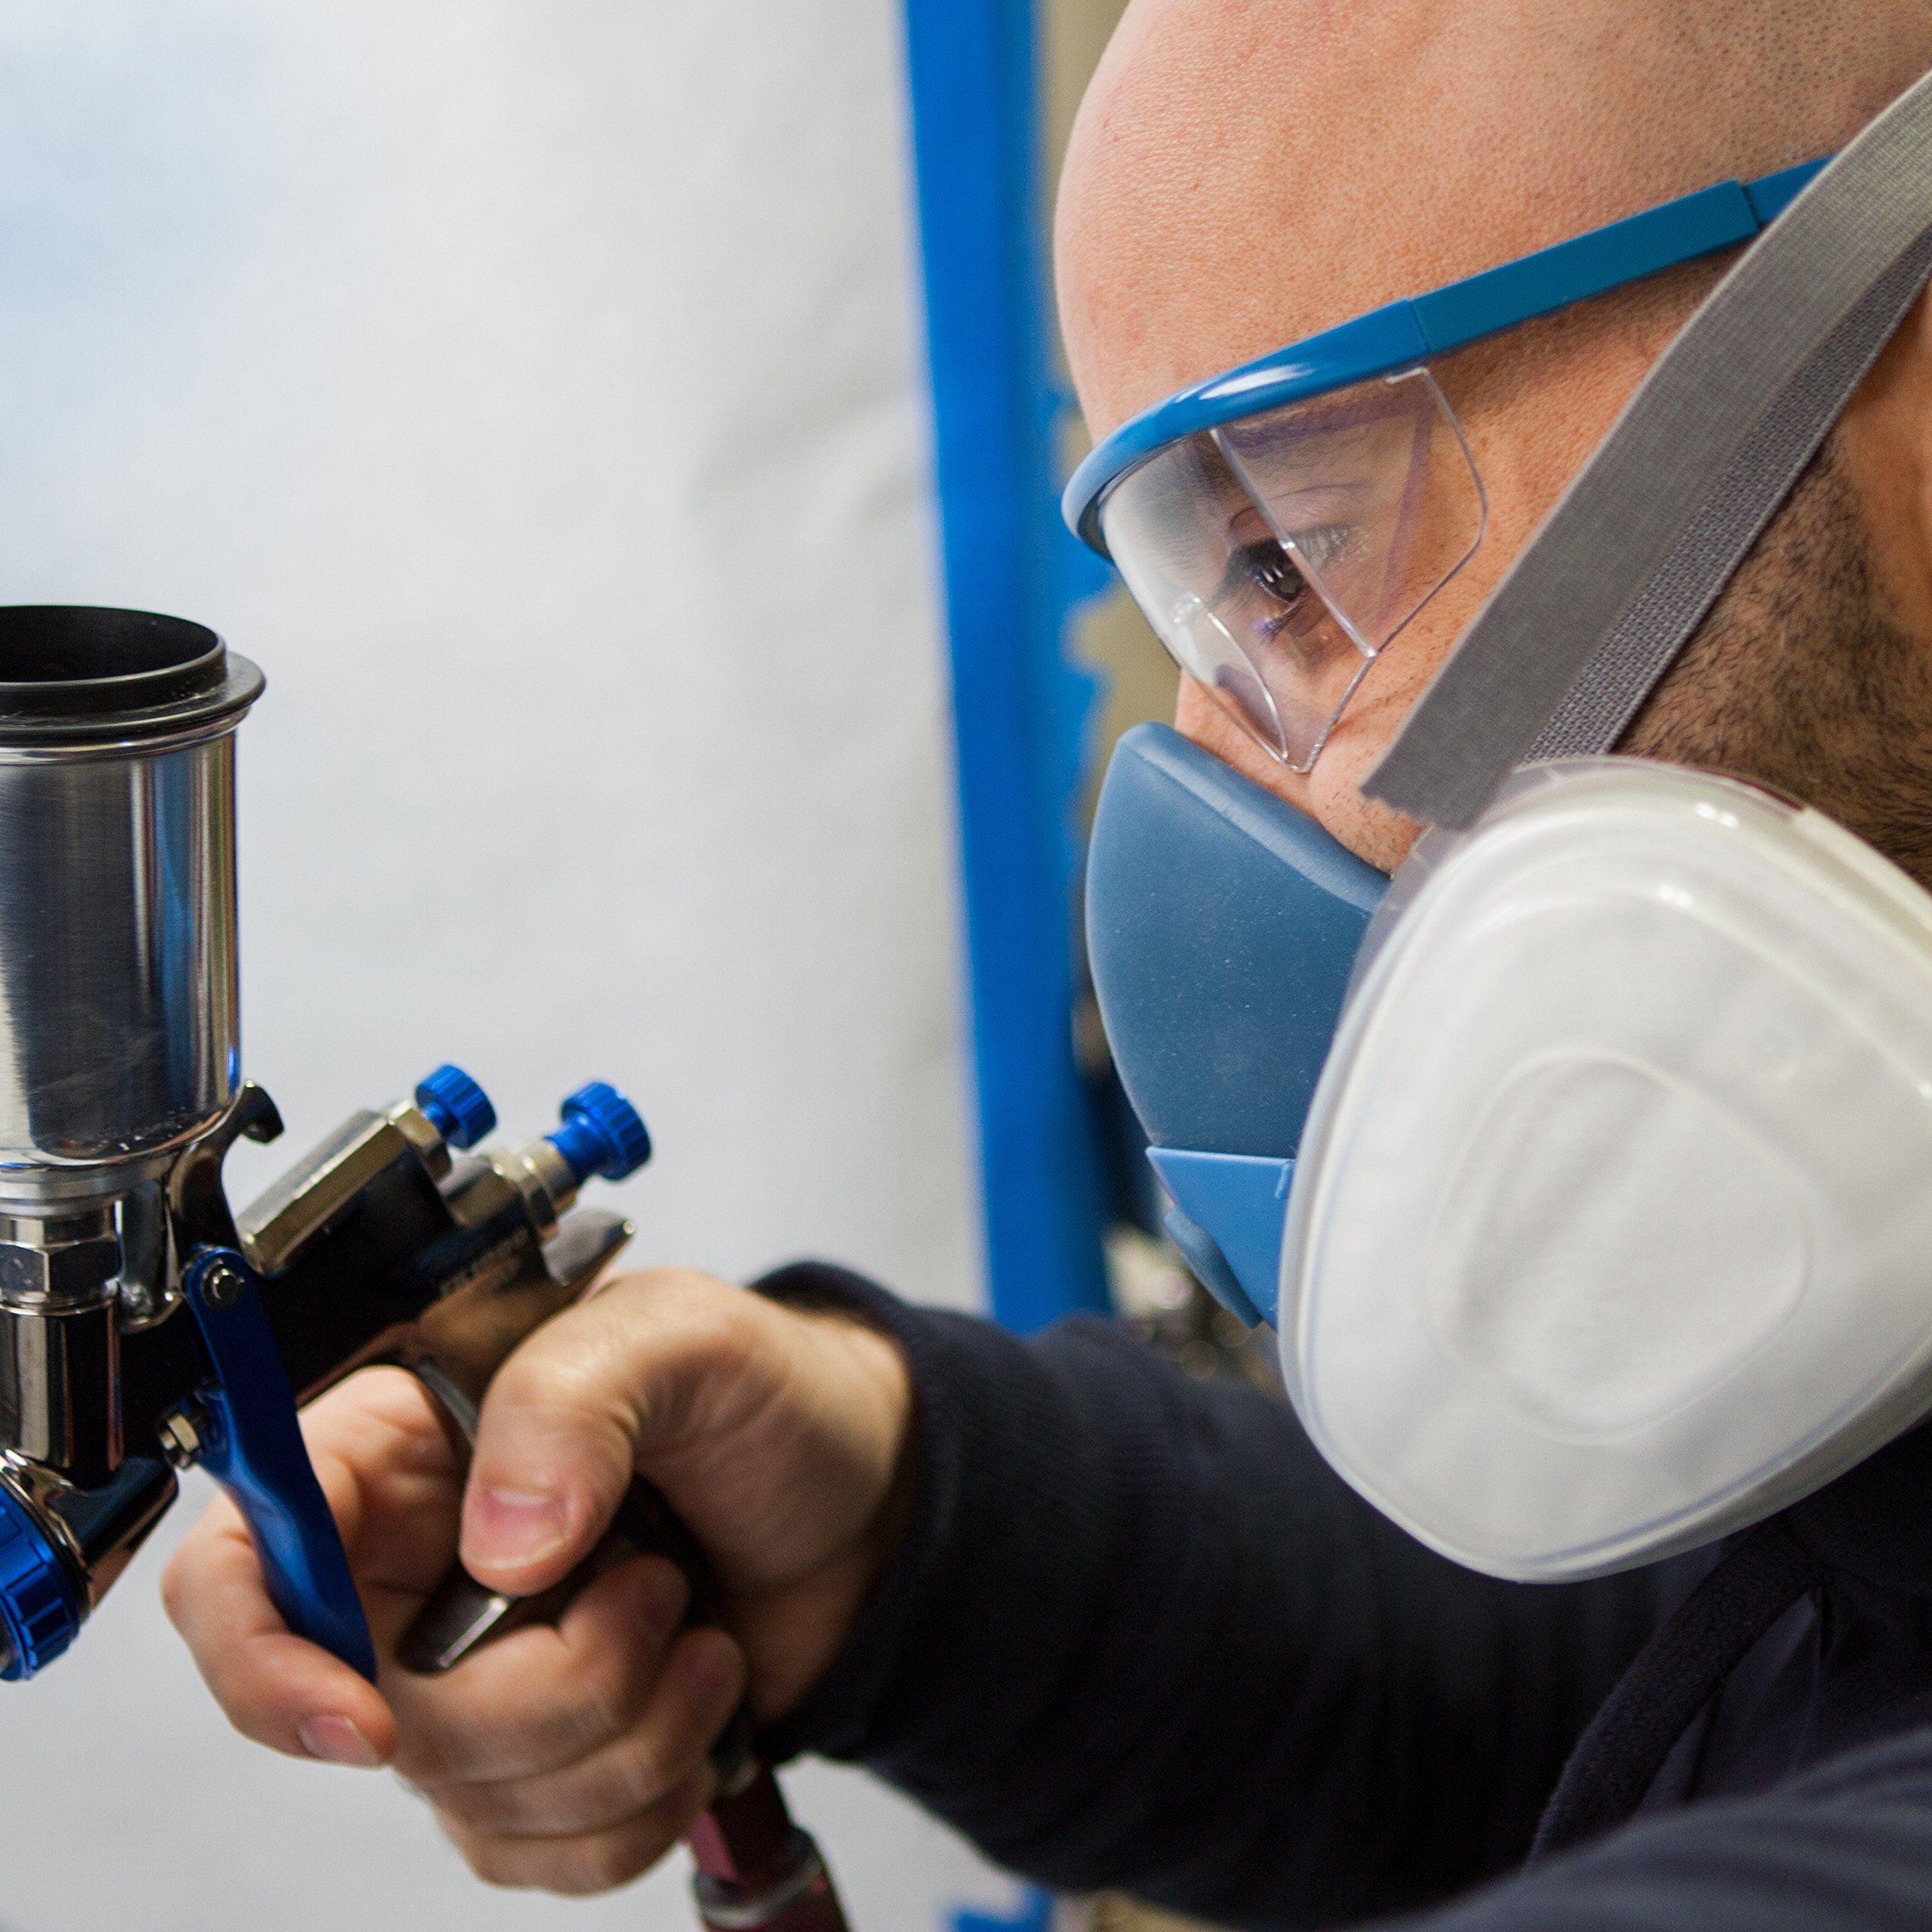 Breath buddy respirator mask plus safety glasses reusable